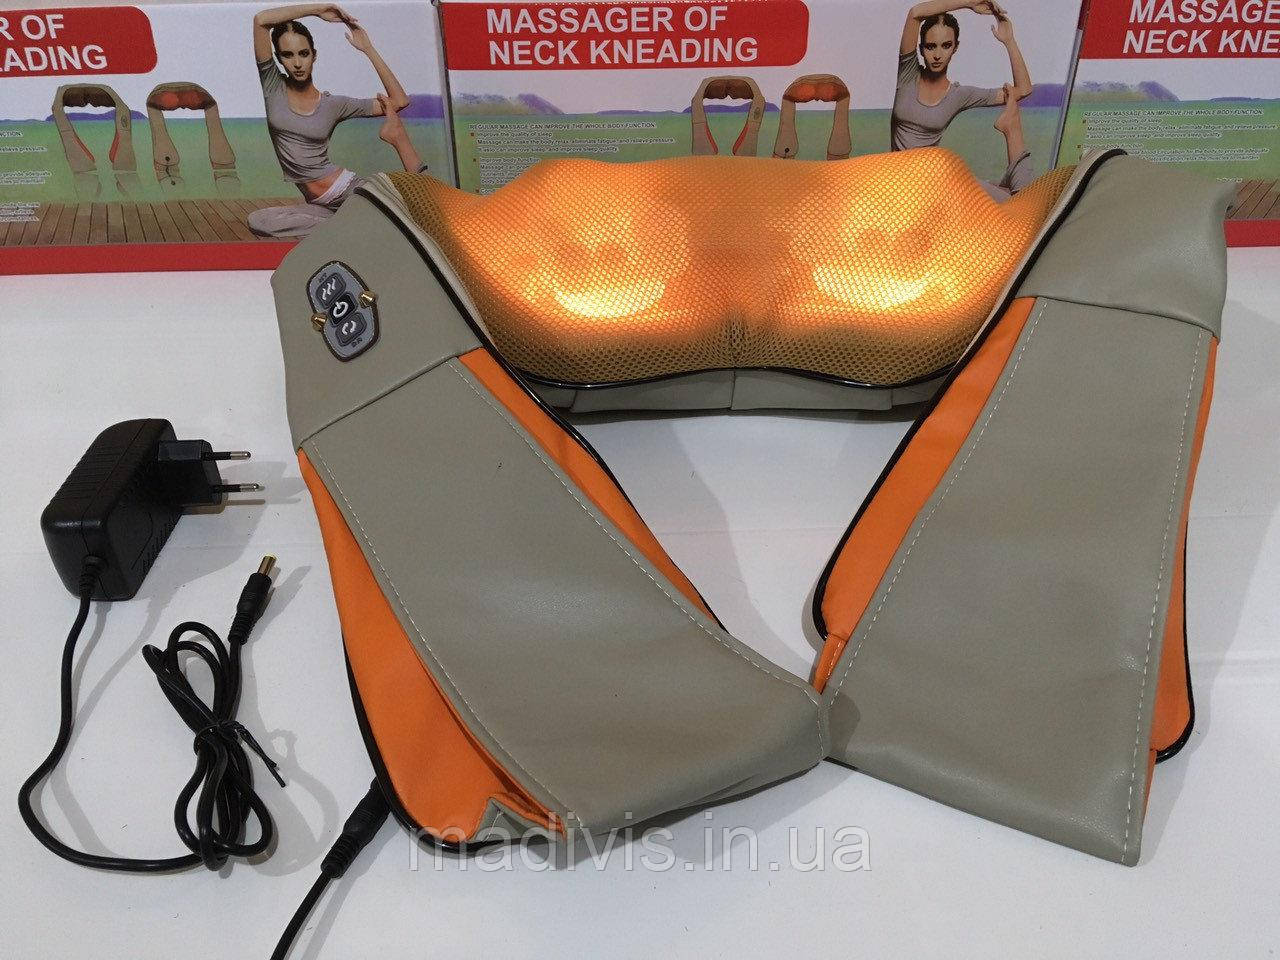 Роликовый массажёр Massager of neck kneading, для шеи и плеч, 12V, 24W